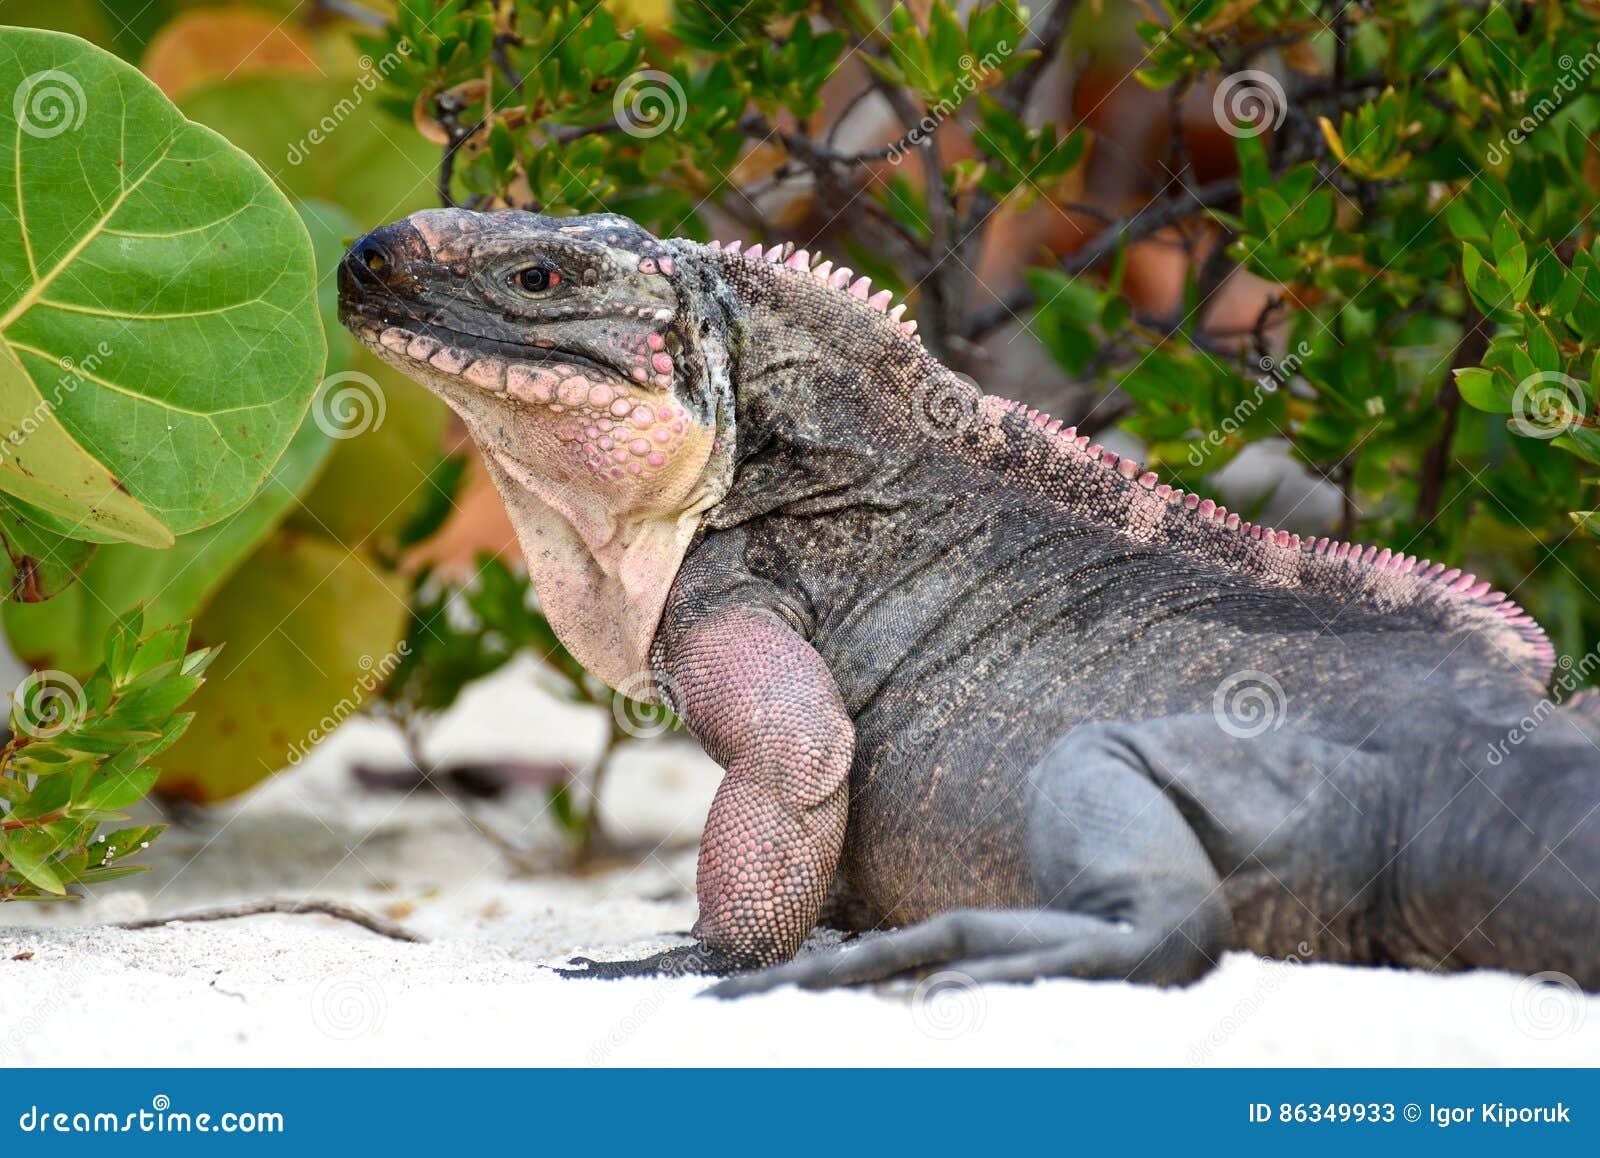 Iguane de roche